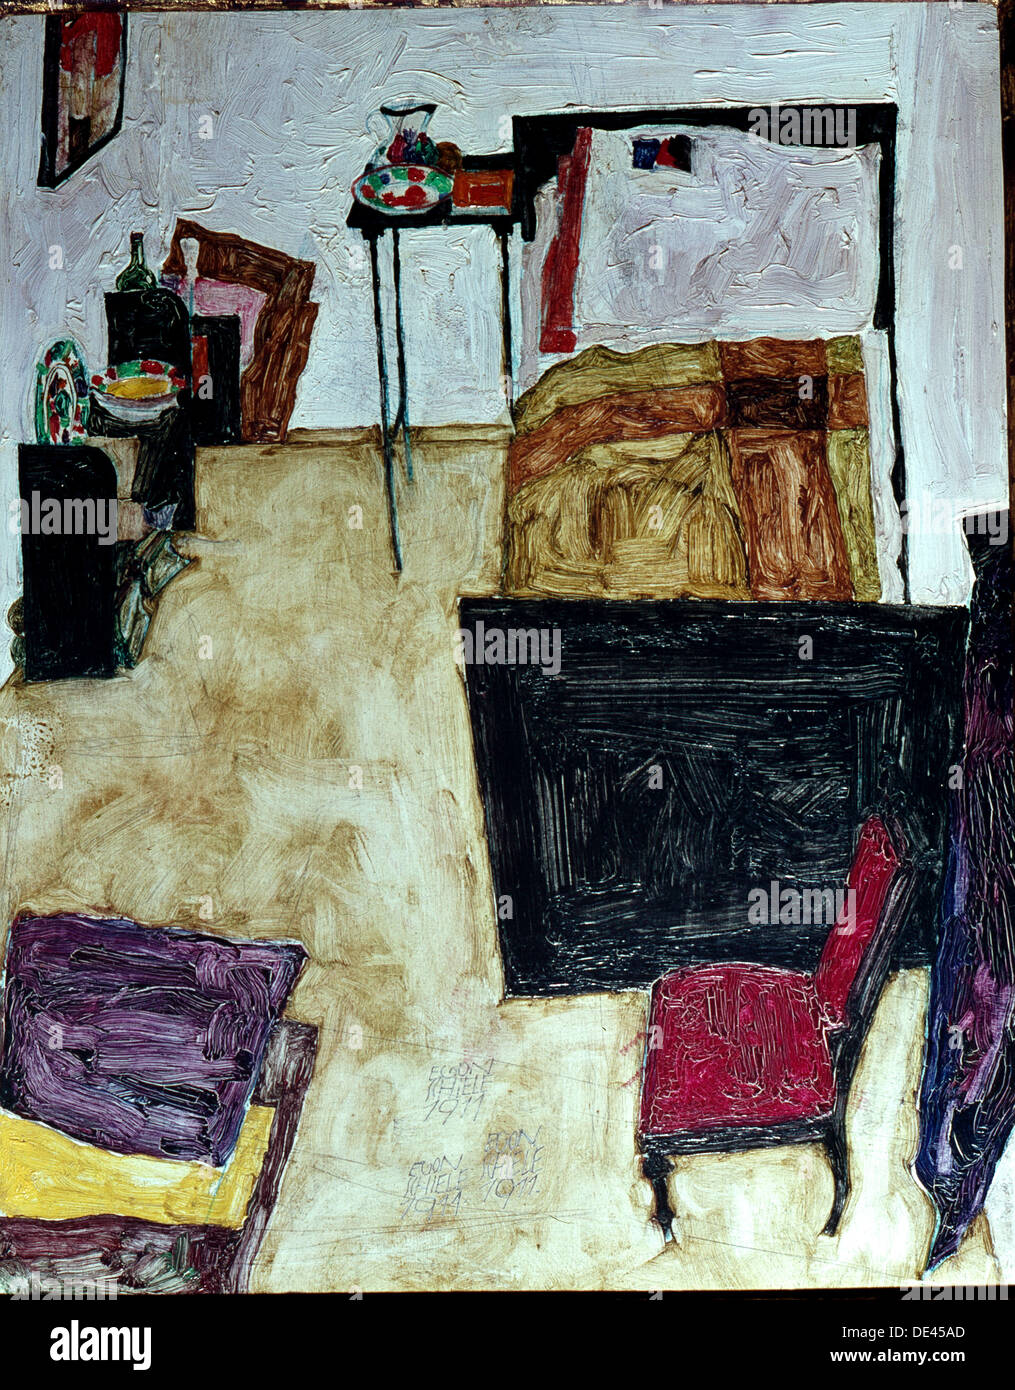 Mein Wohnzimmer, painting by Egon Schiele Stock Photo: 60328309 - Alamy